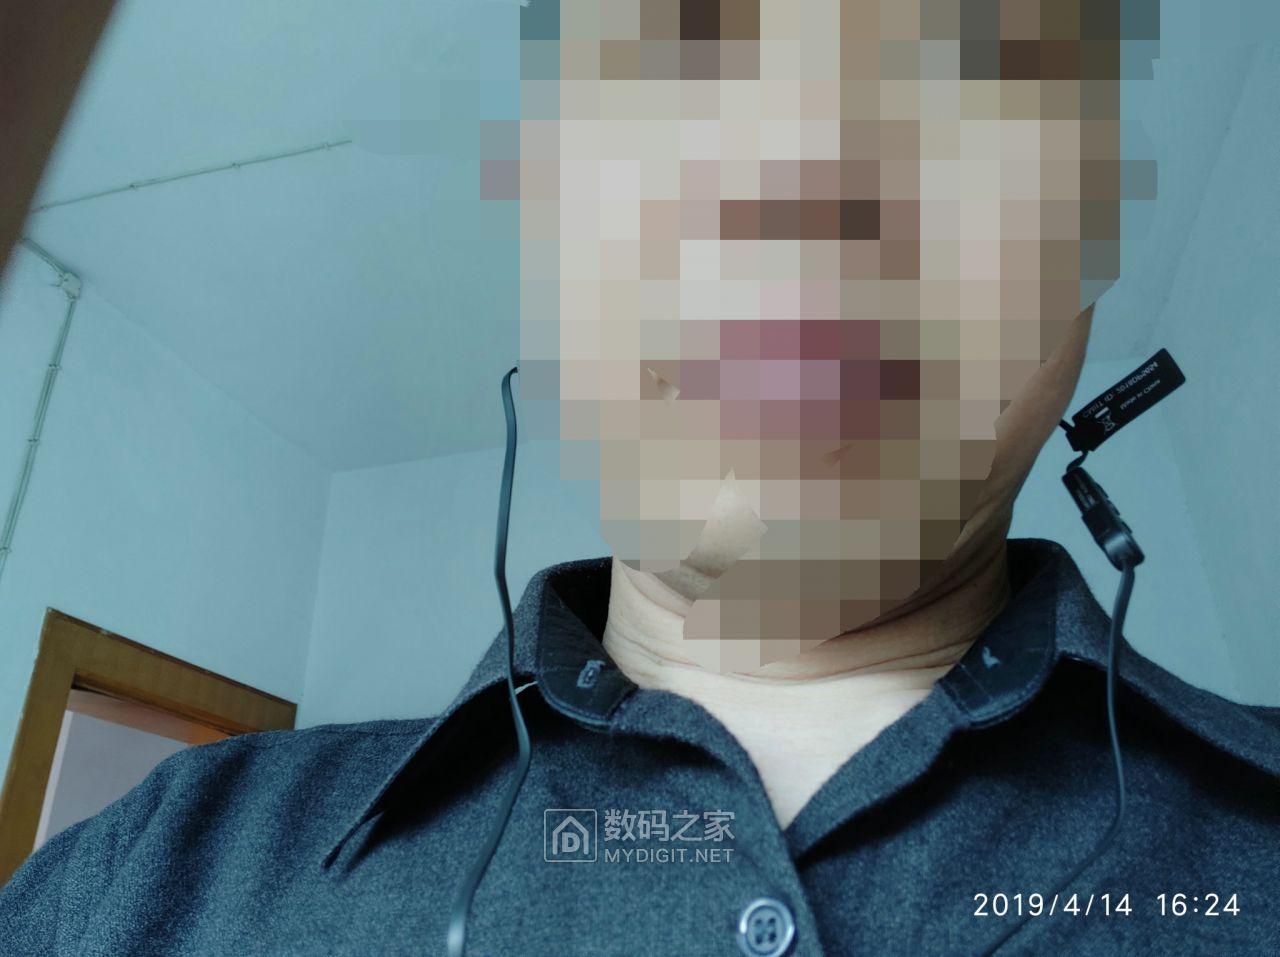 IMG_20190414_162418.jpg